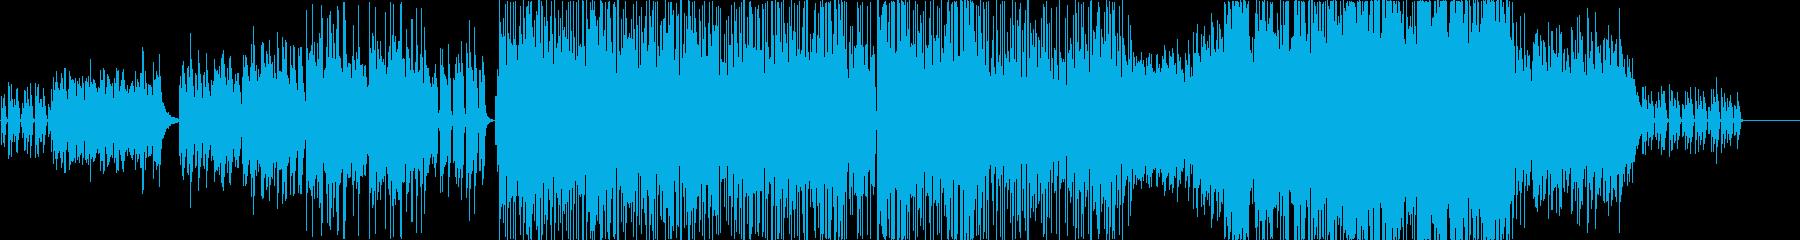 Ranunculusの再生済みの波形